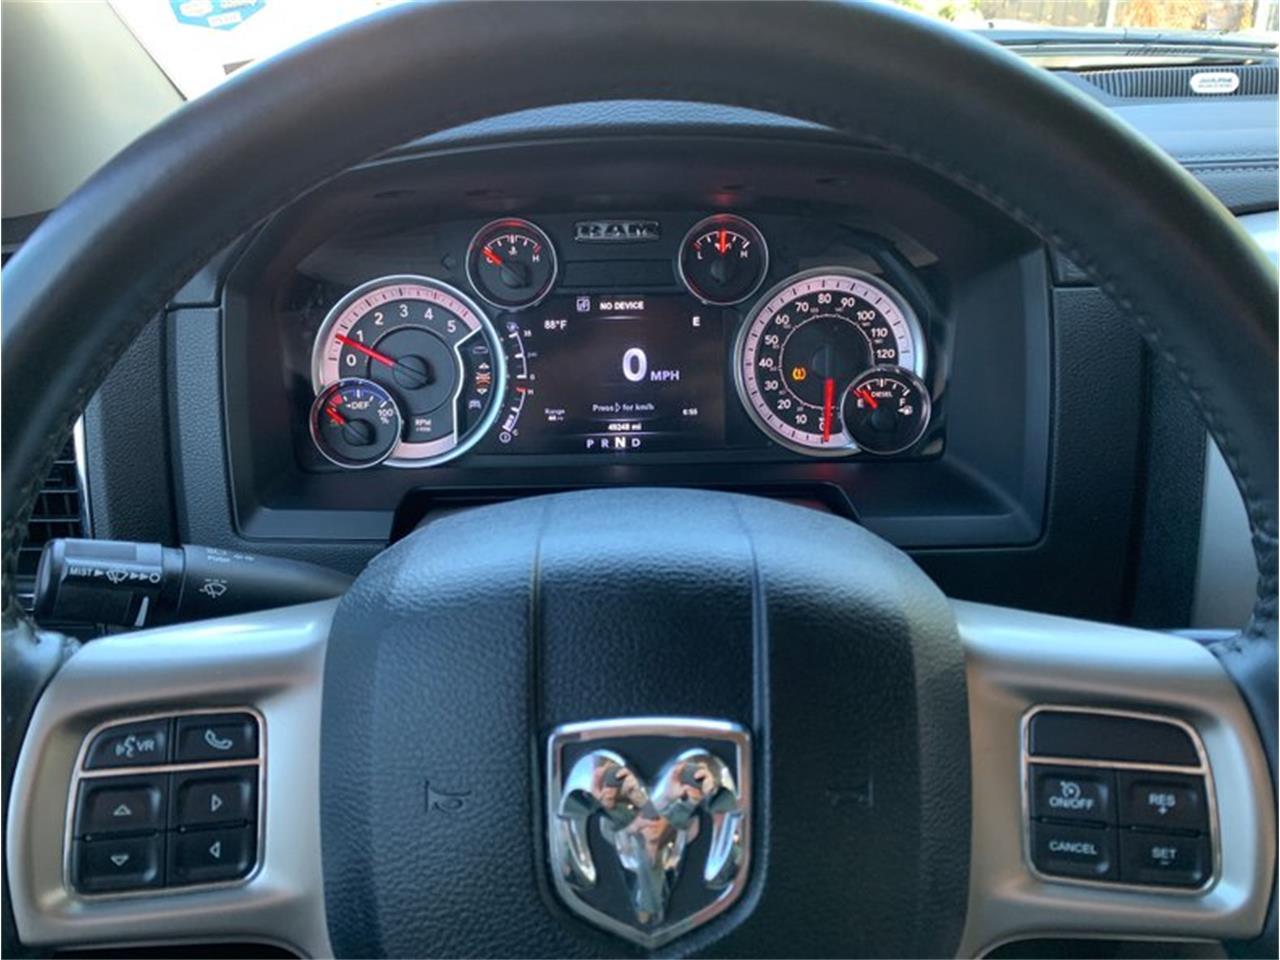 2017 Dodge Ram 2500 (CC-1268211) for sale in San Diego, California